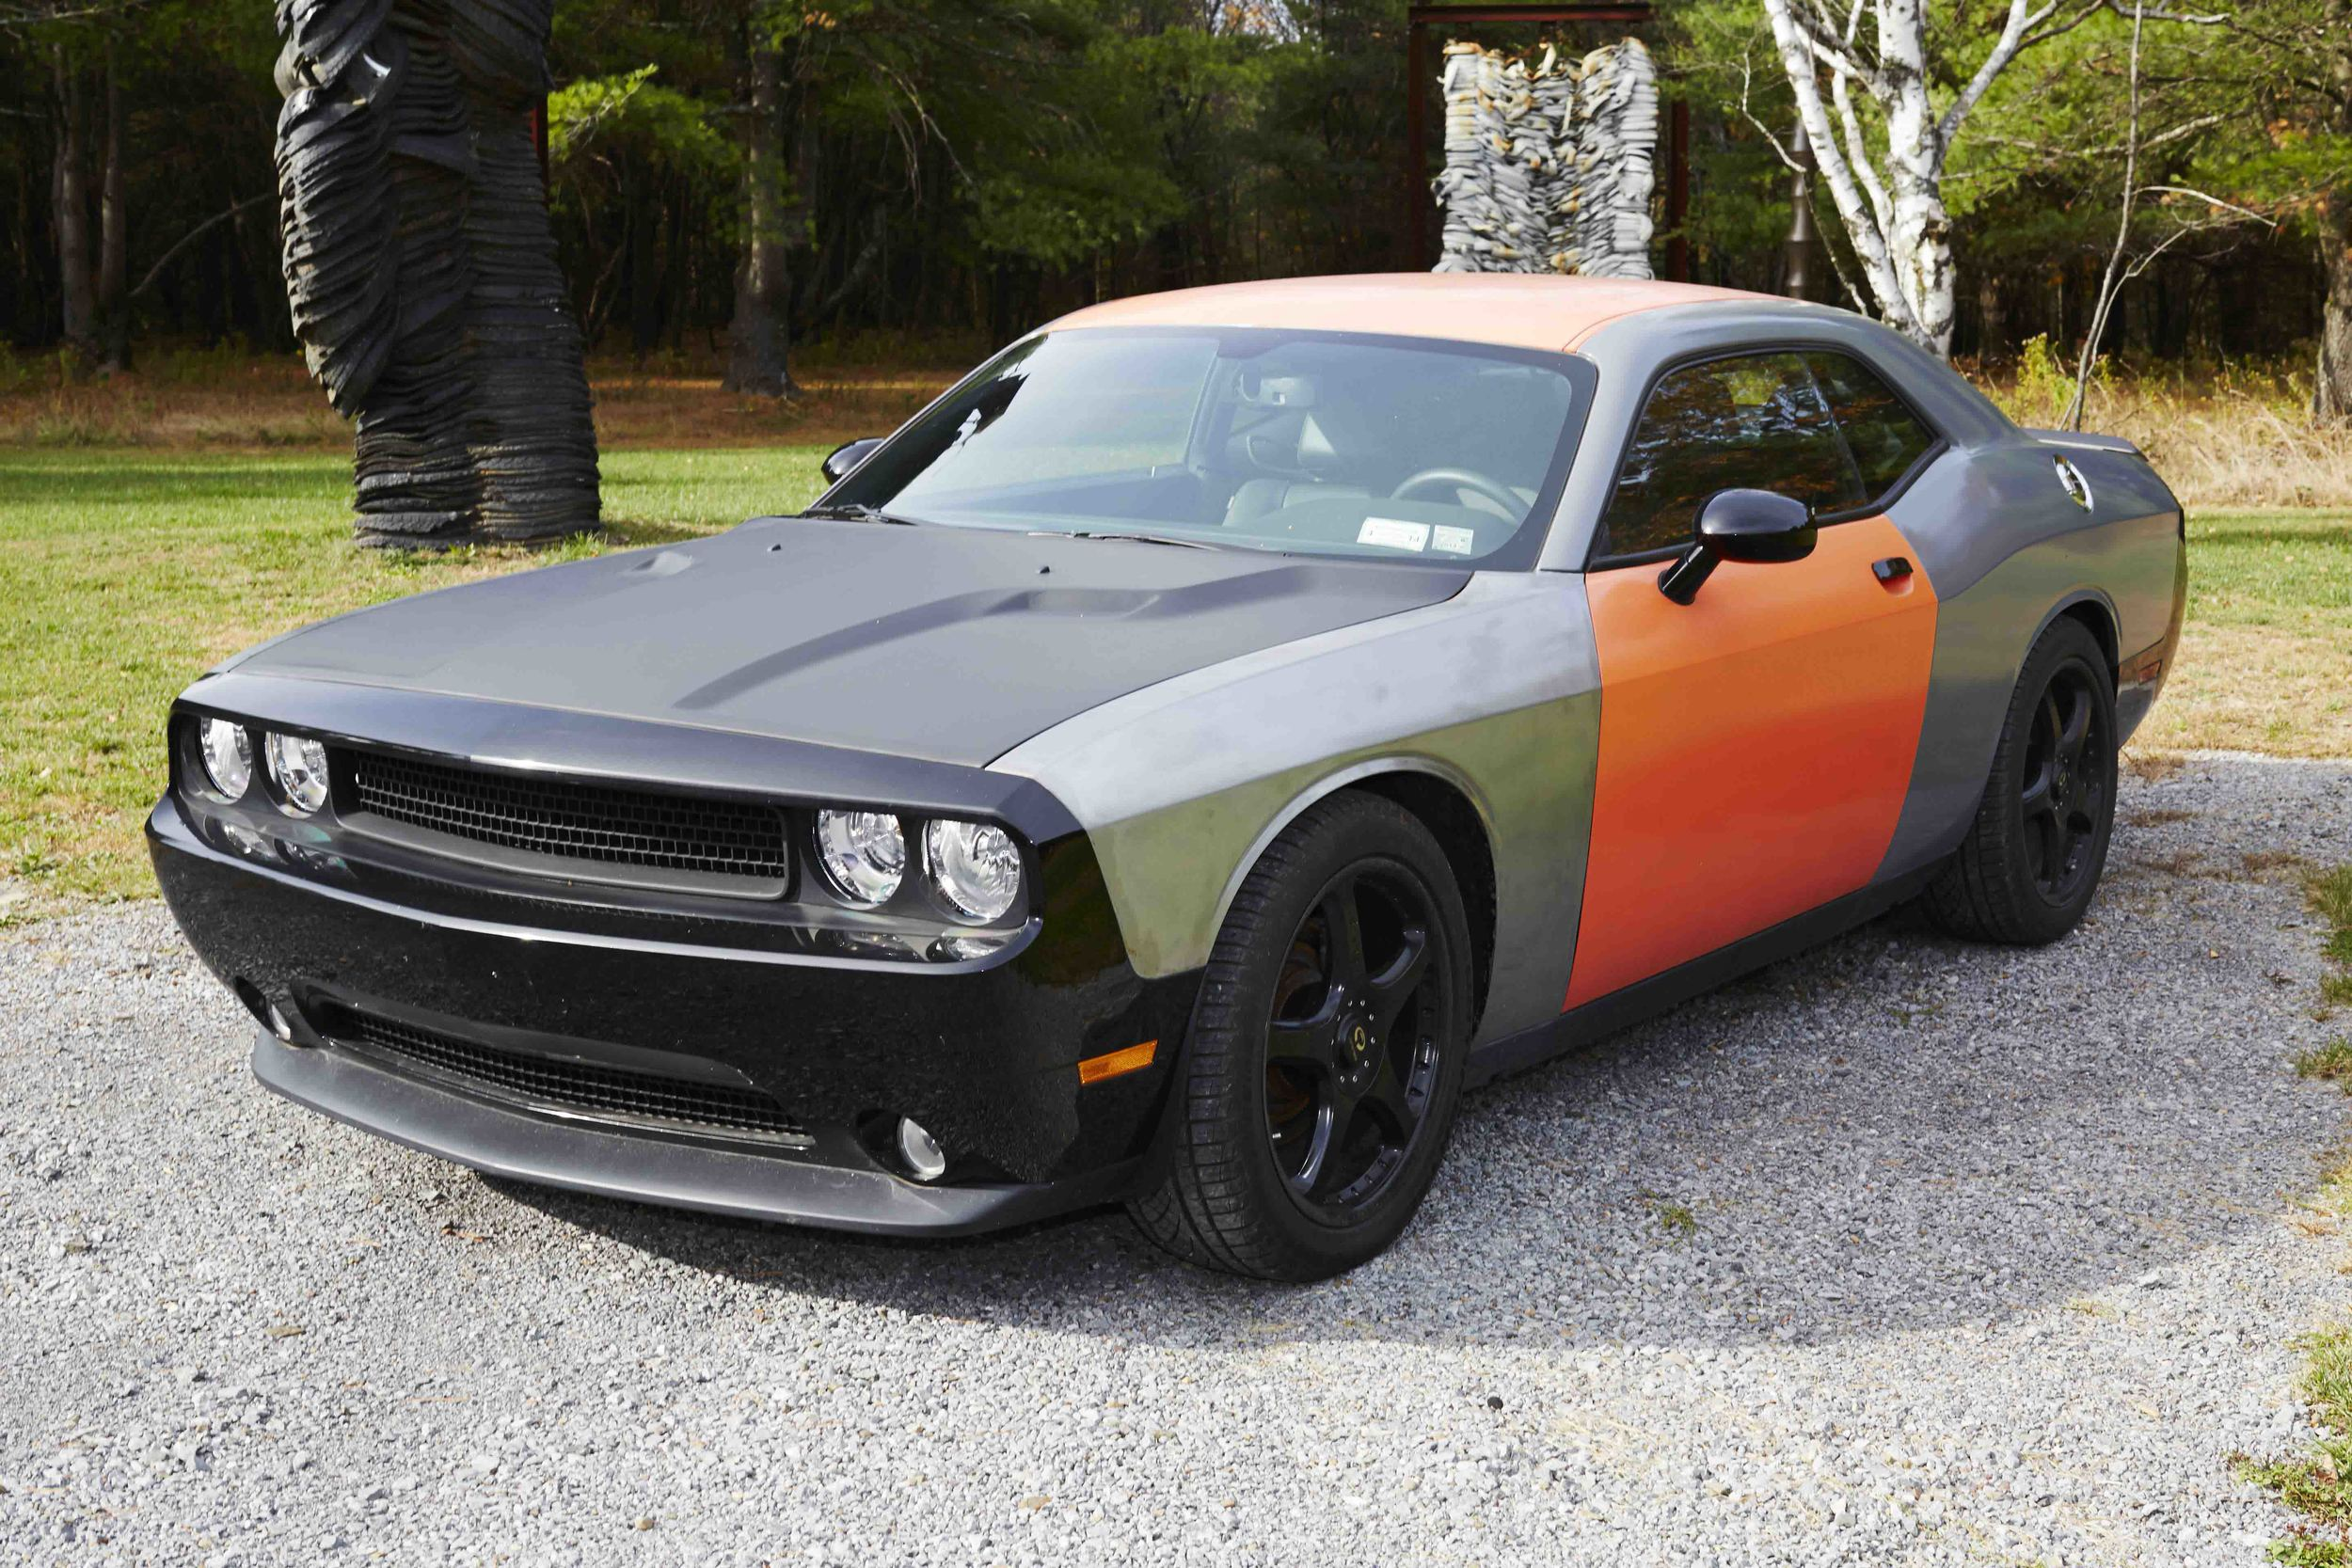 Richard Prince,Vanishing Point (The Artist Cut) (Car), 2012-13;2012 Dodge Challenger R/T